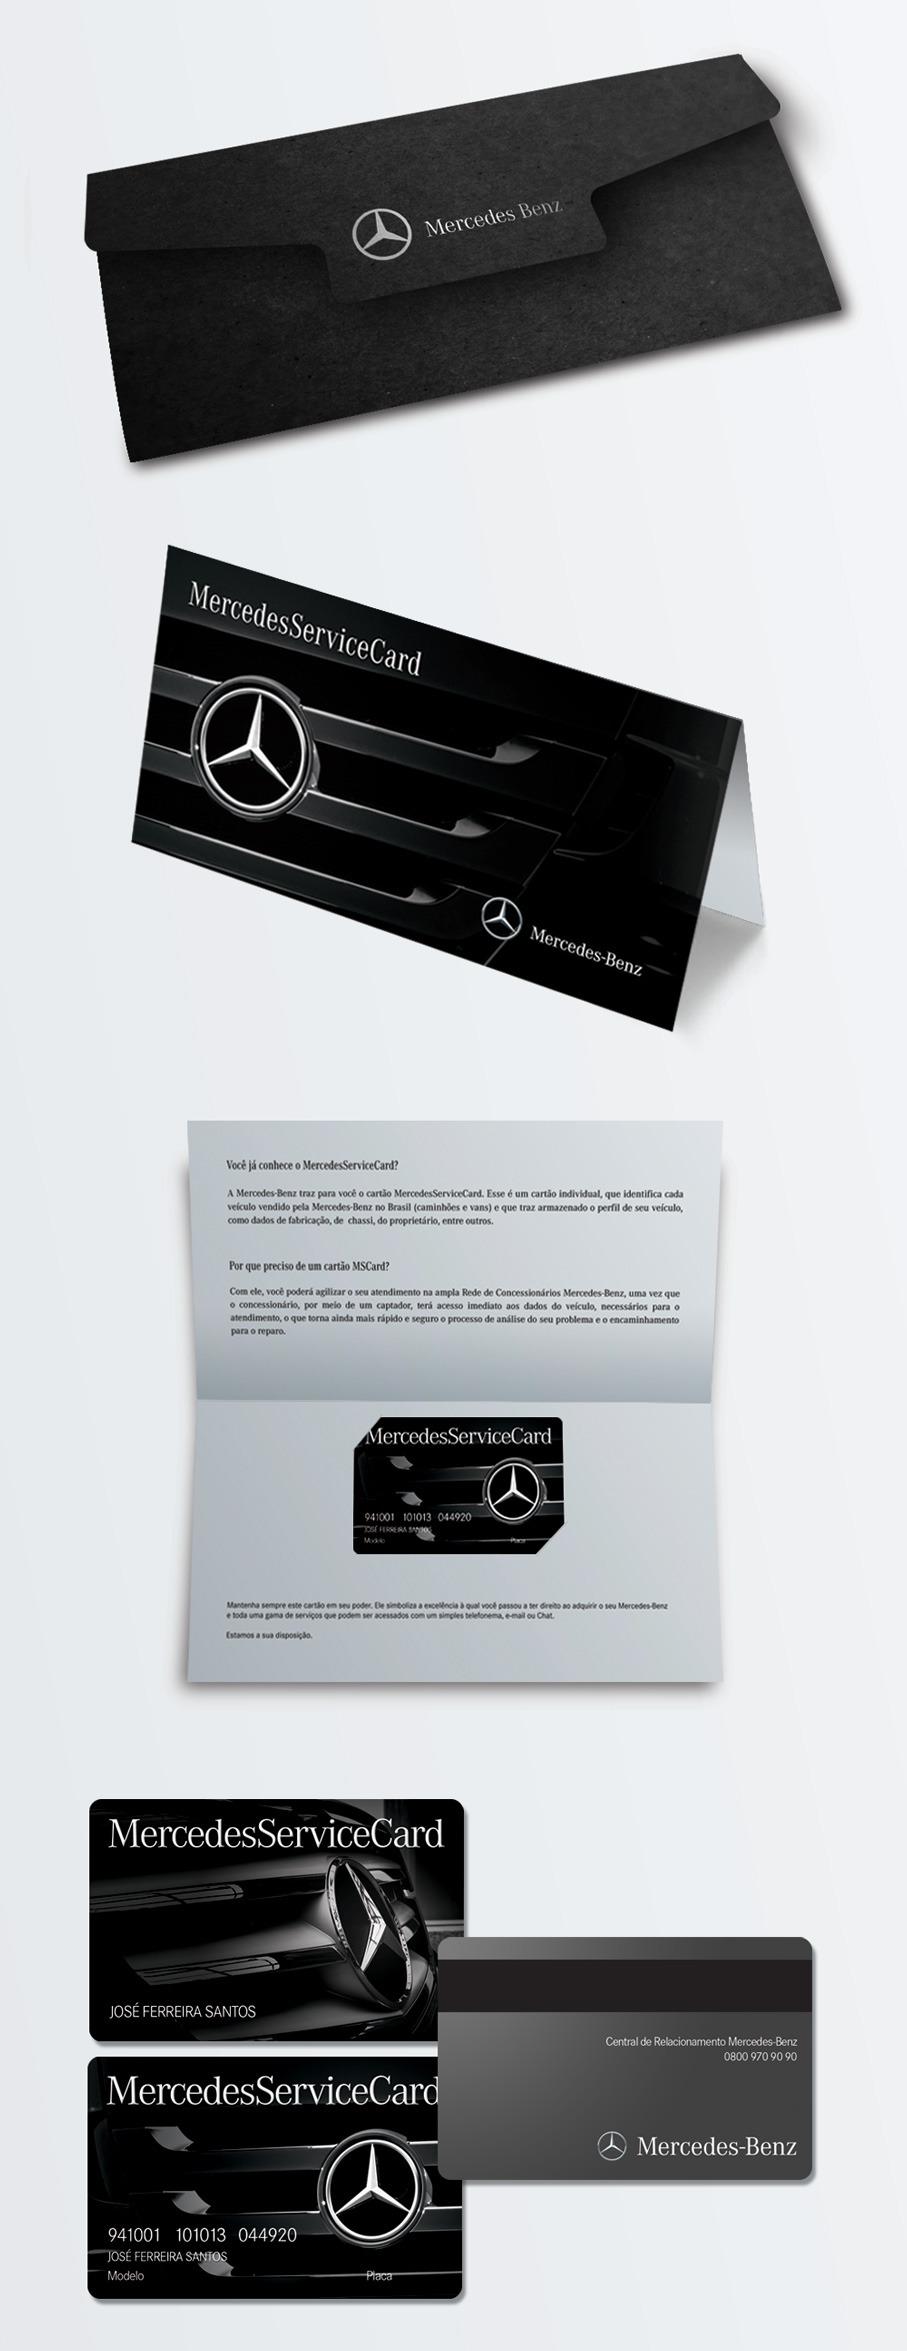 Mercedes benz cart o ms card paulofragatti for Mercedes benz card